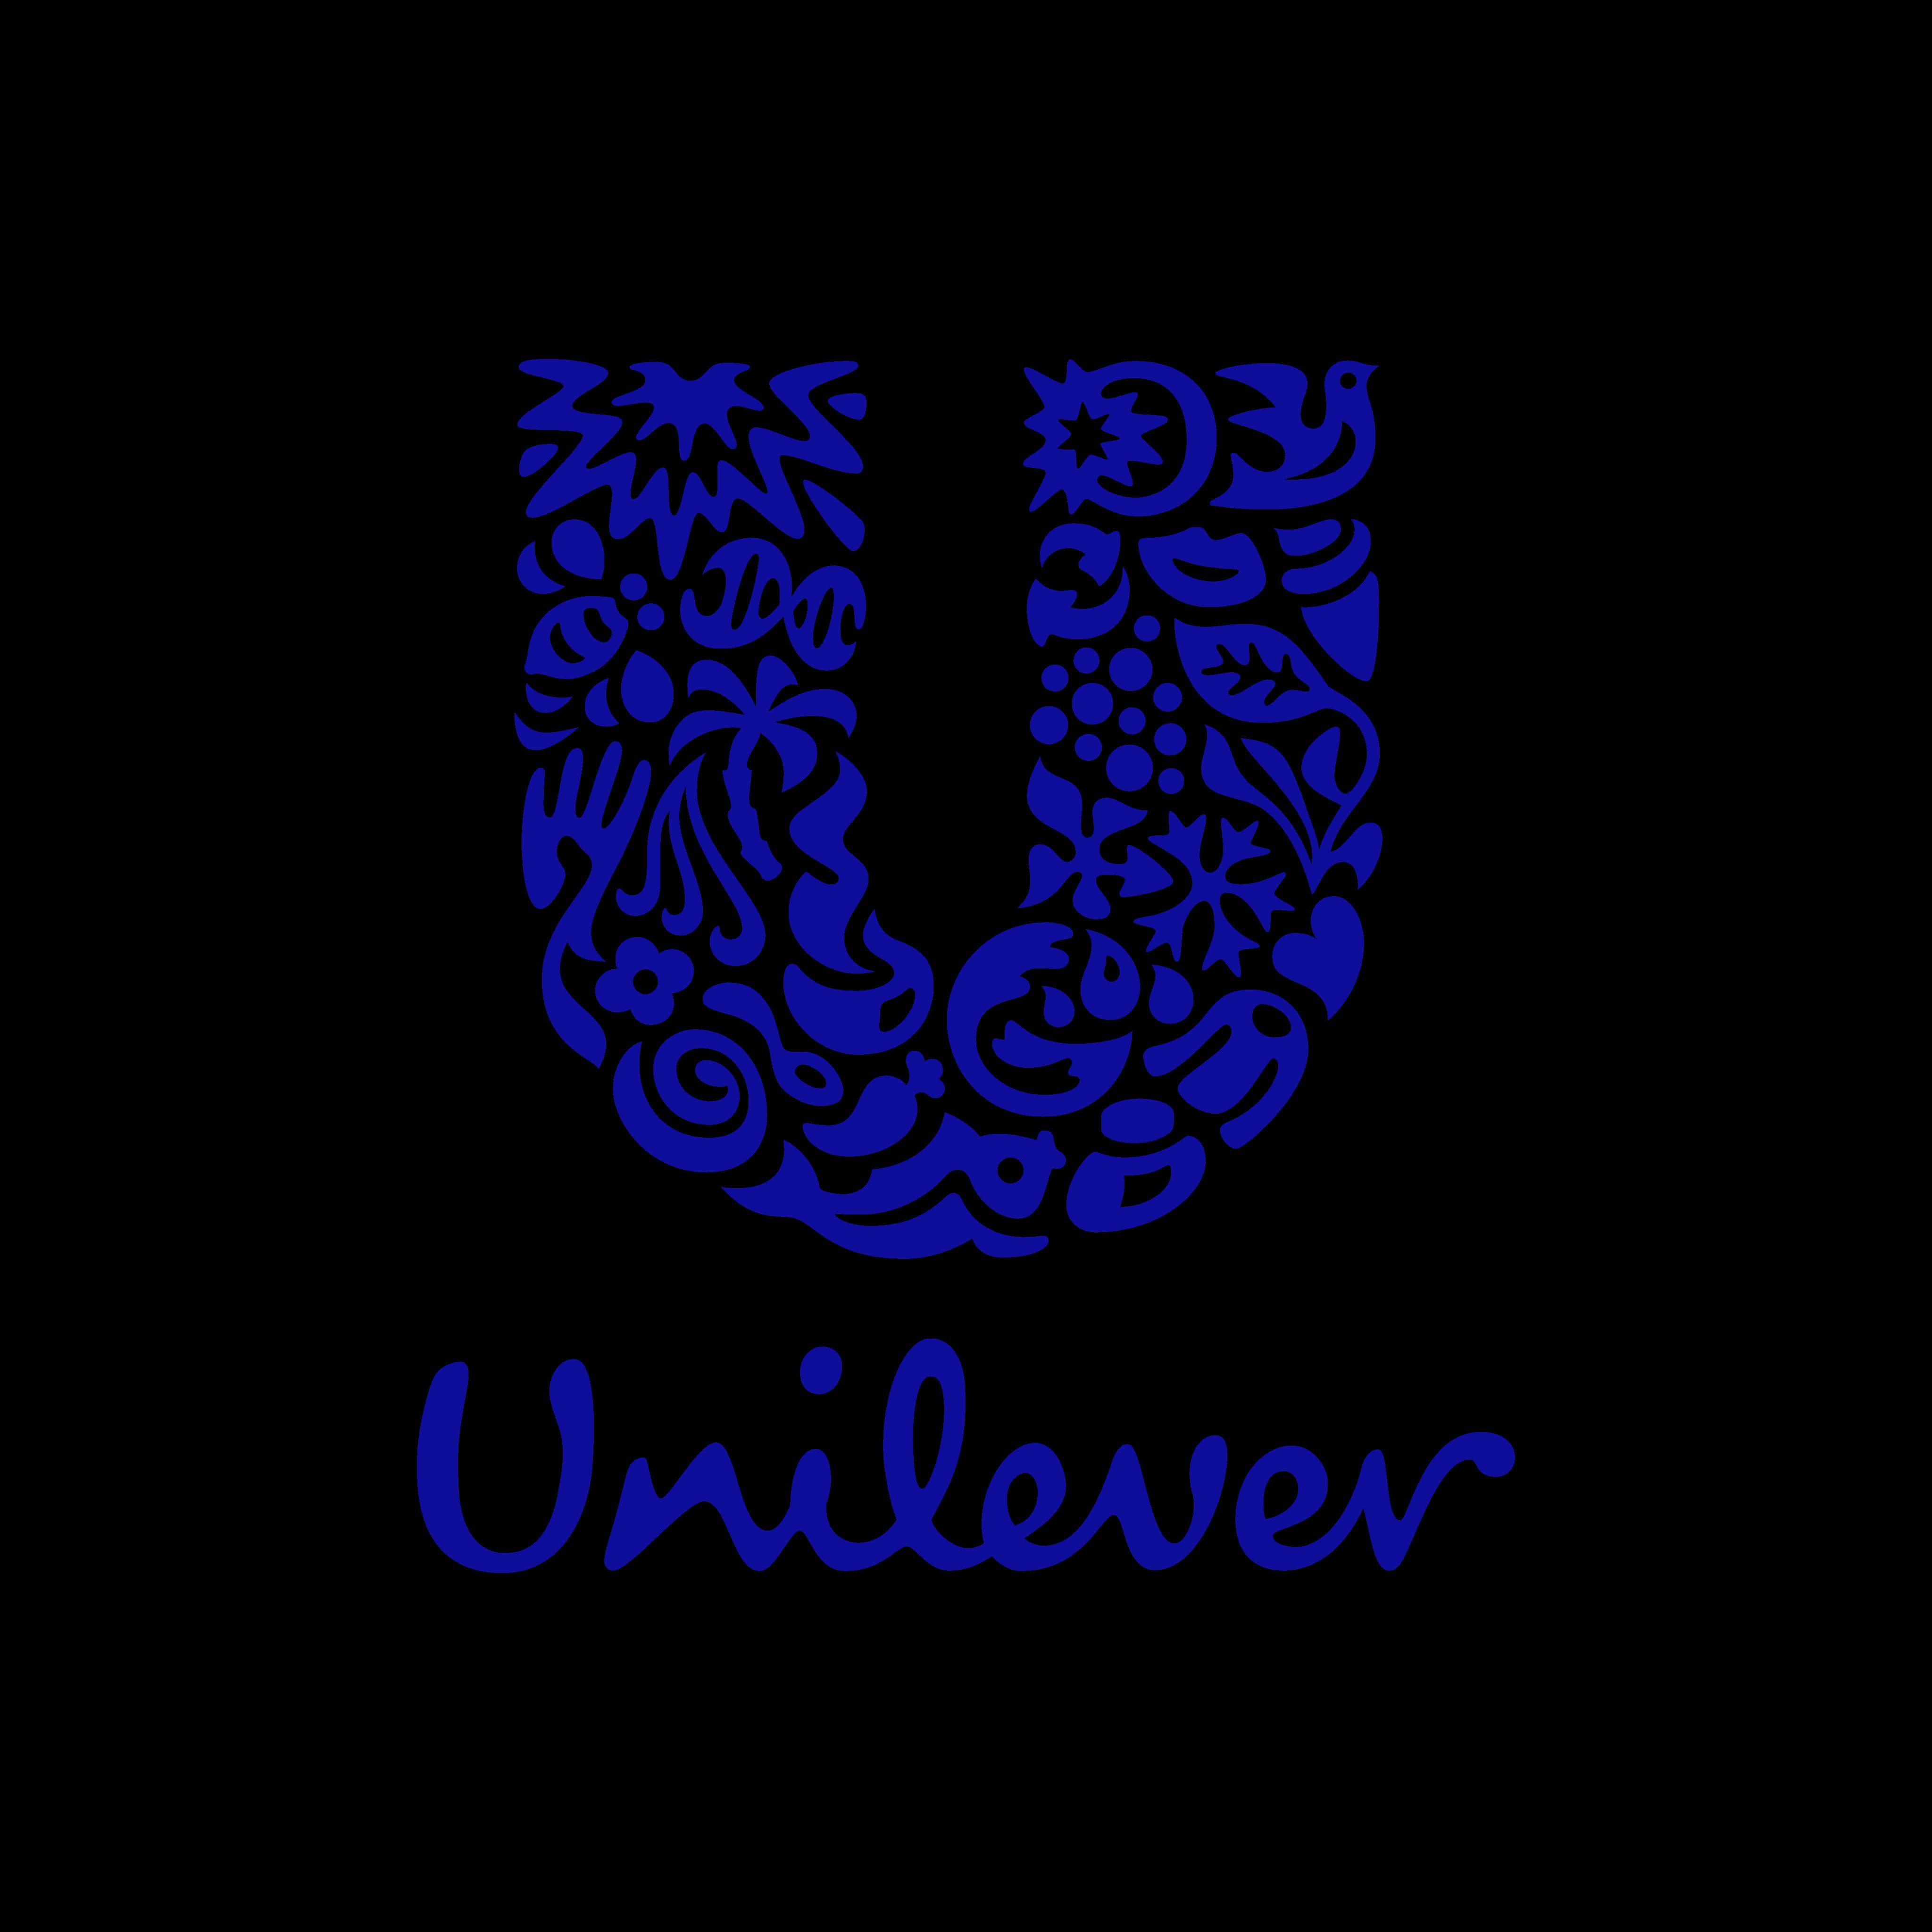 unilever logo 0 - Unilever Logo